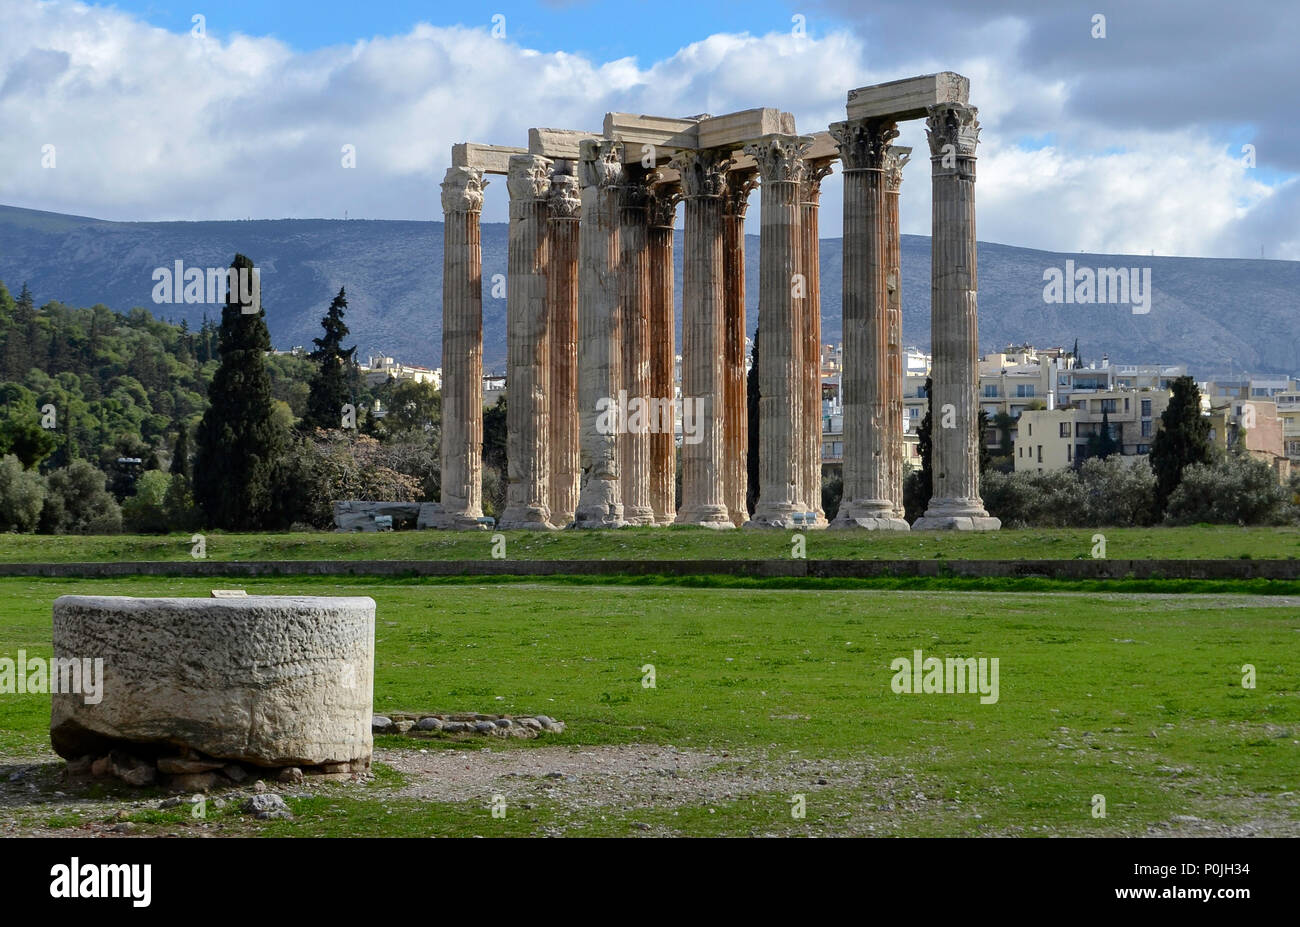 Roman Temple of Olympian Zeus in Athens, Greece - Stock Image